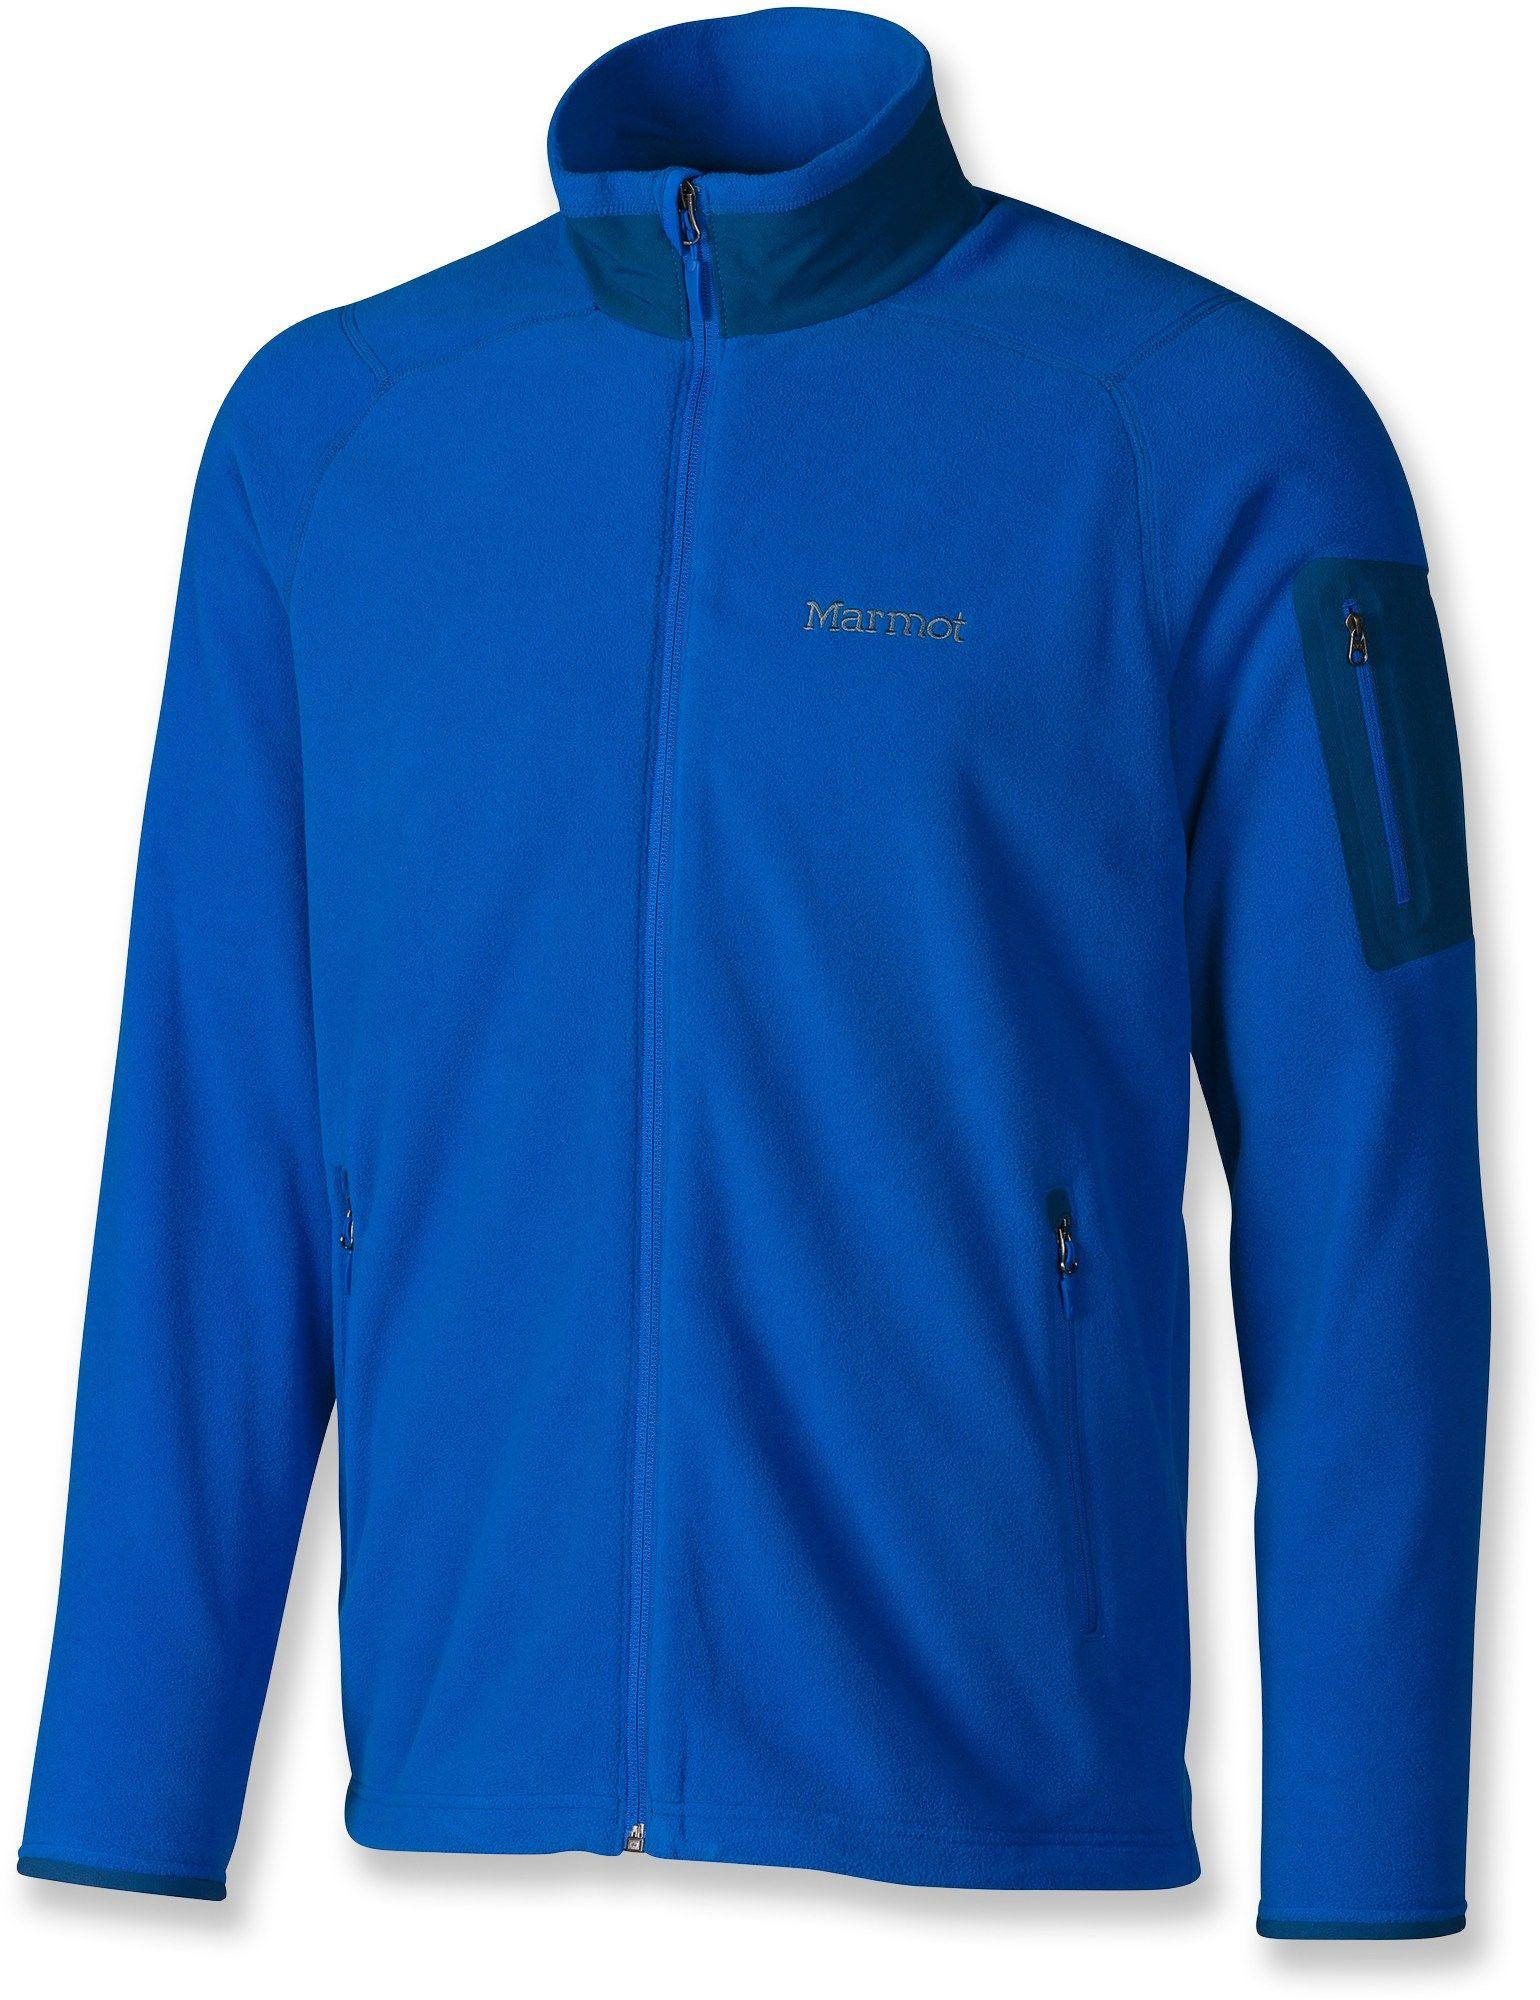 Marmot male reactor fleece jacket menus apparel u accessories